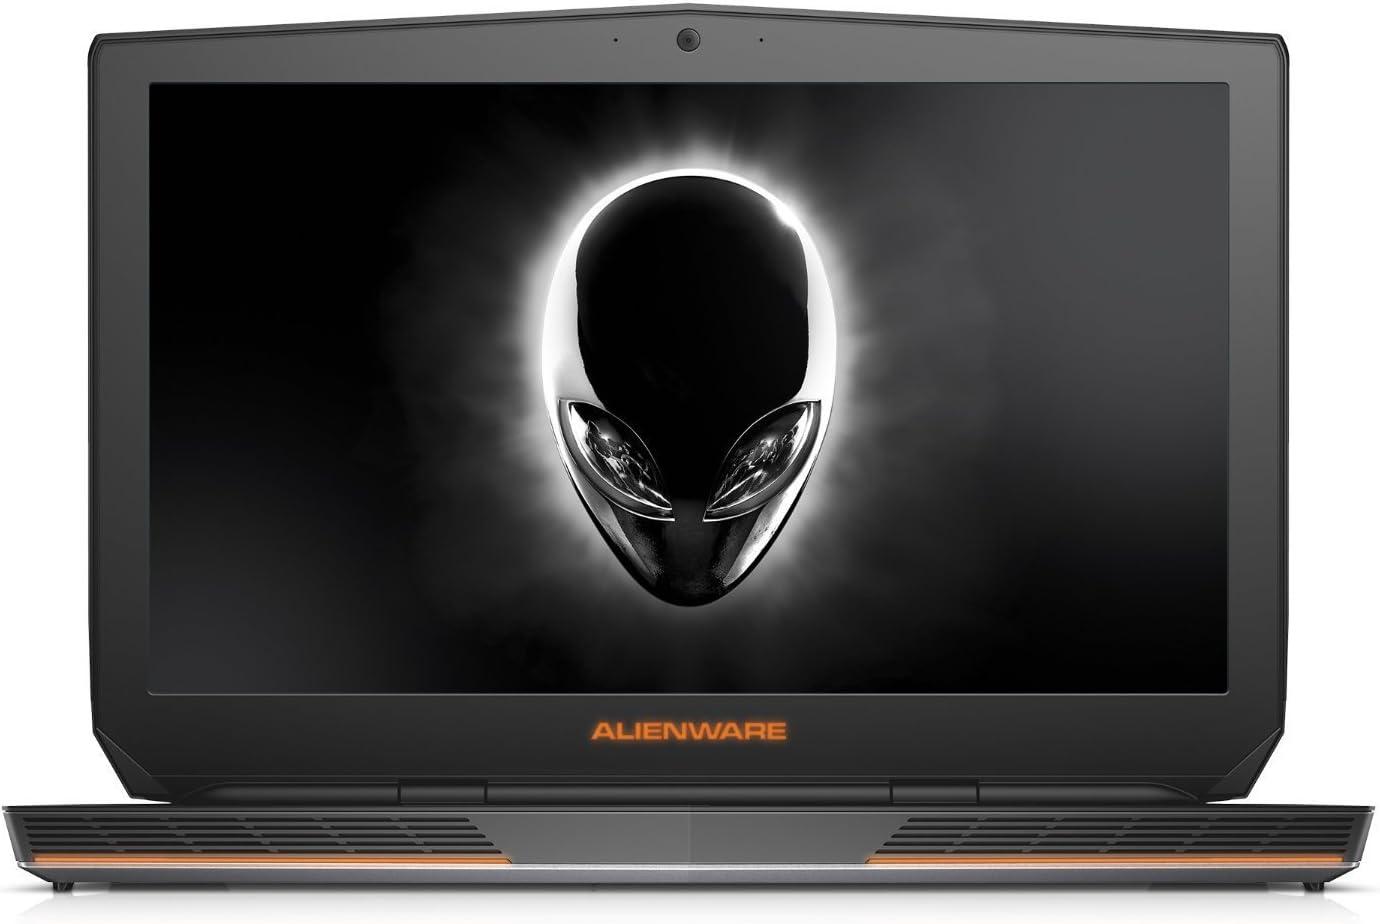 Alienware 17 AW17R3 17.3-Inch Full HD Gaming Laptop, 6th Gen Intel Core i7-6700HQ UP to 3.5GHz, 16GB Memory, 512GB SSD (128GB SSD x 4) + 2TB Hard Drive, 3GB GeForce GTX 970M Graphics, Windows 10